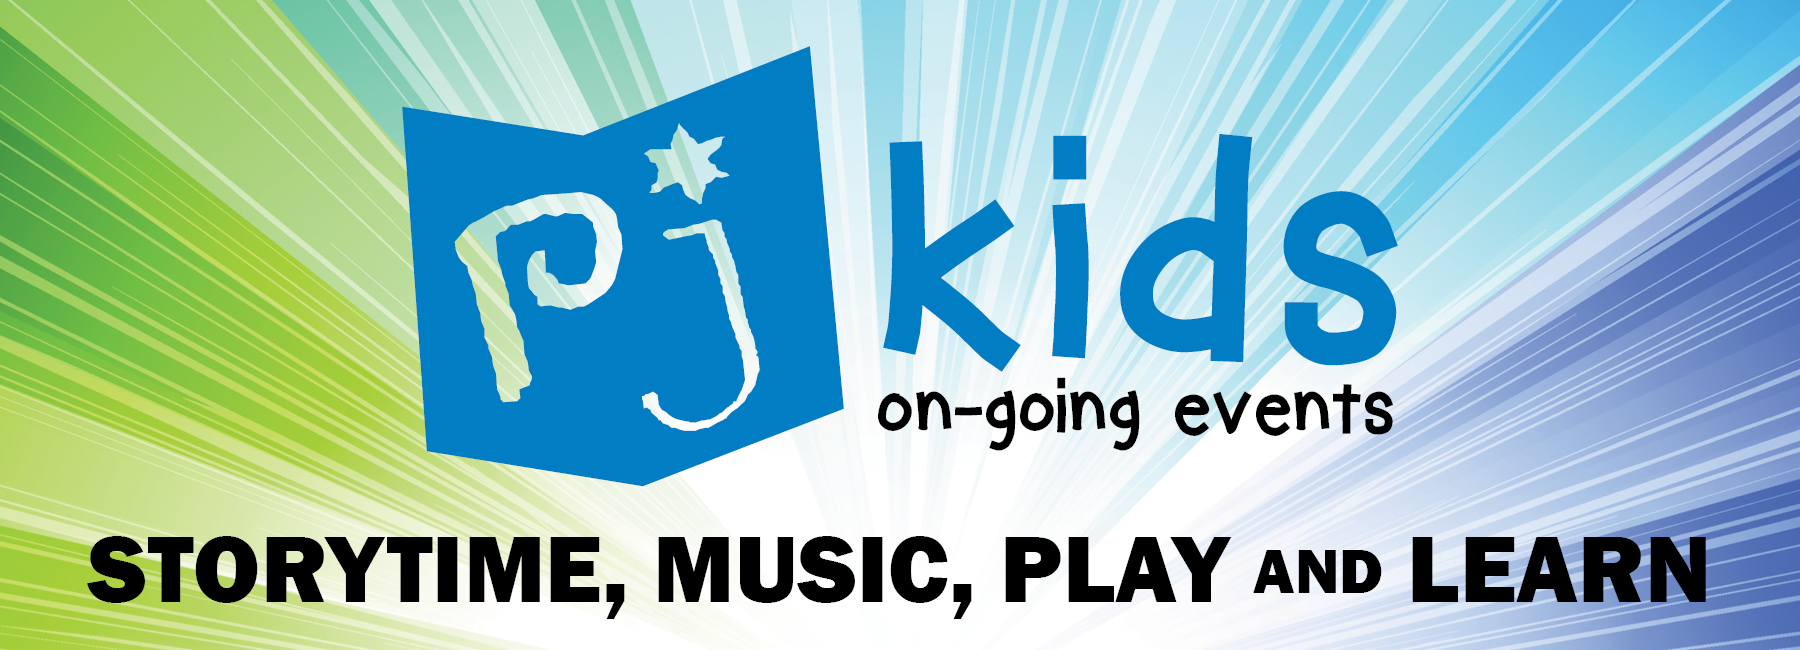 2260_kids programs_web slide